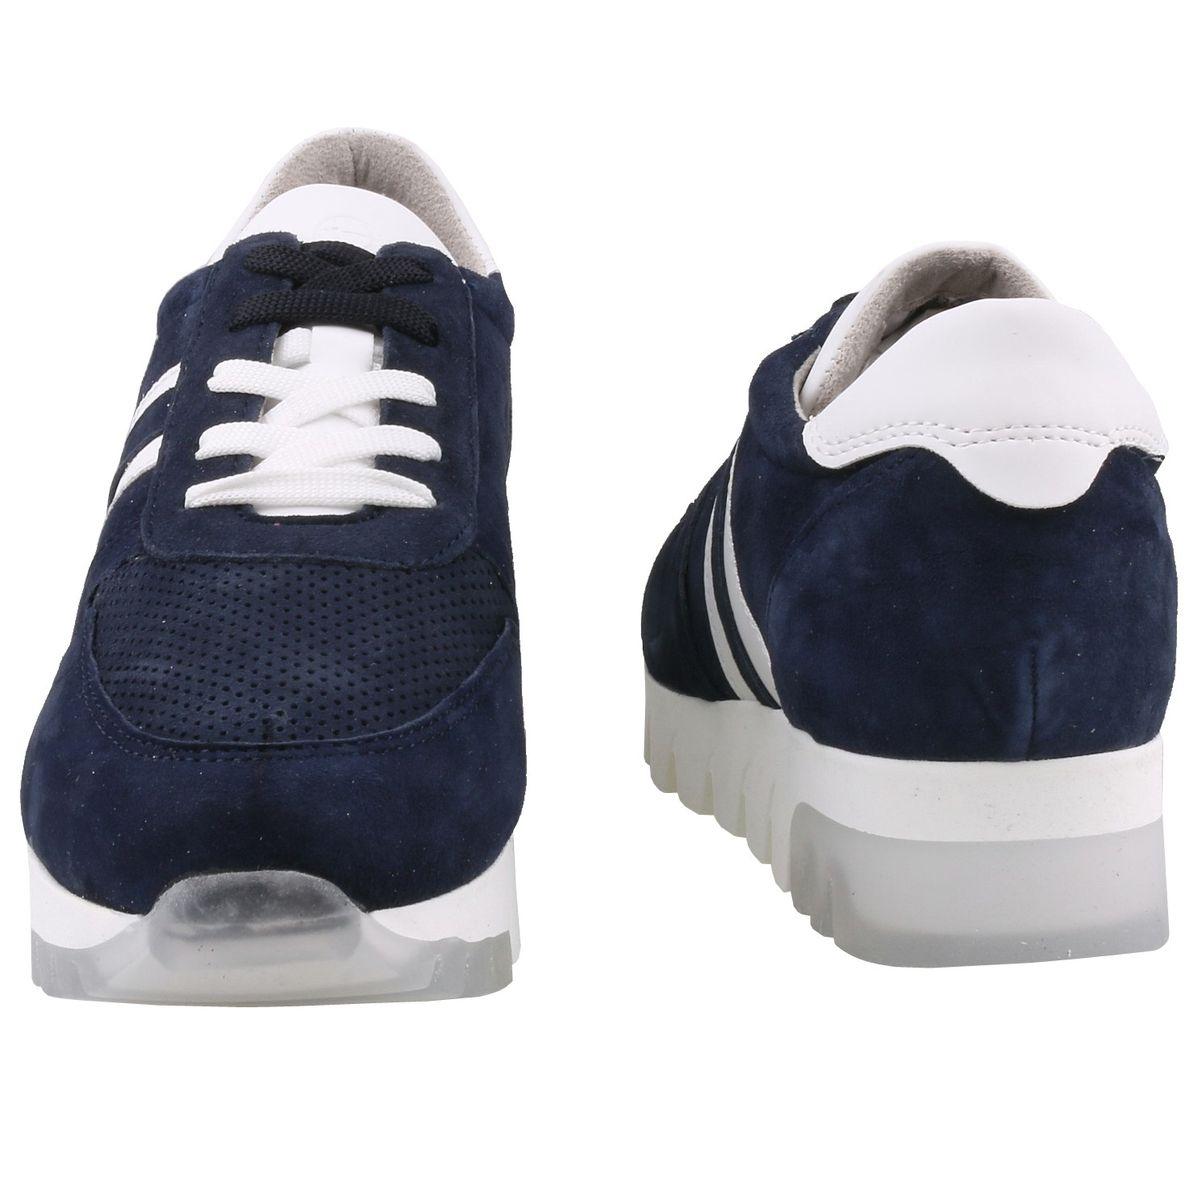 TAMARIS Damen Plateau Sneaker Blau